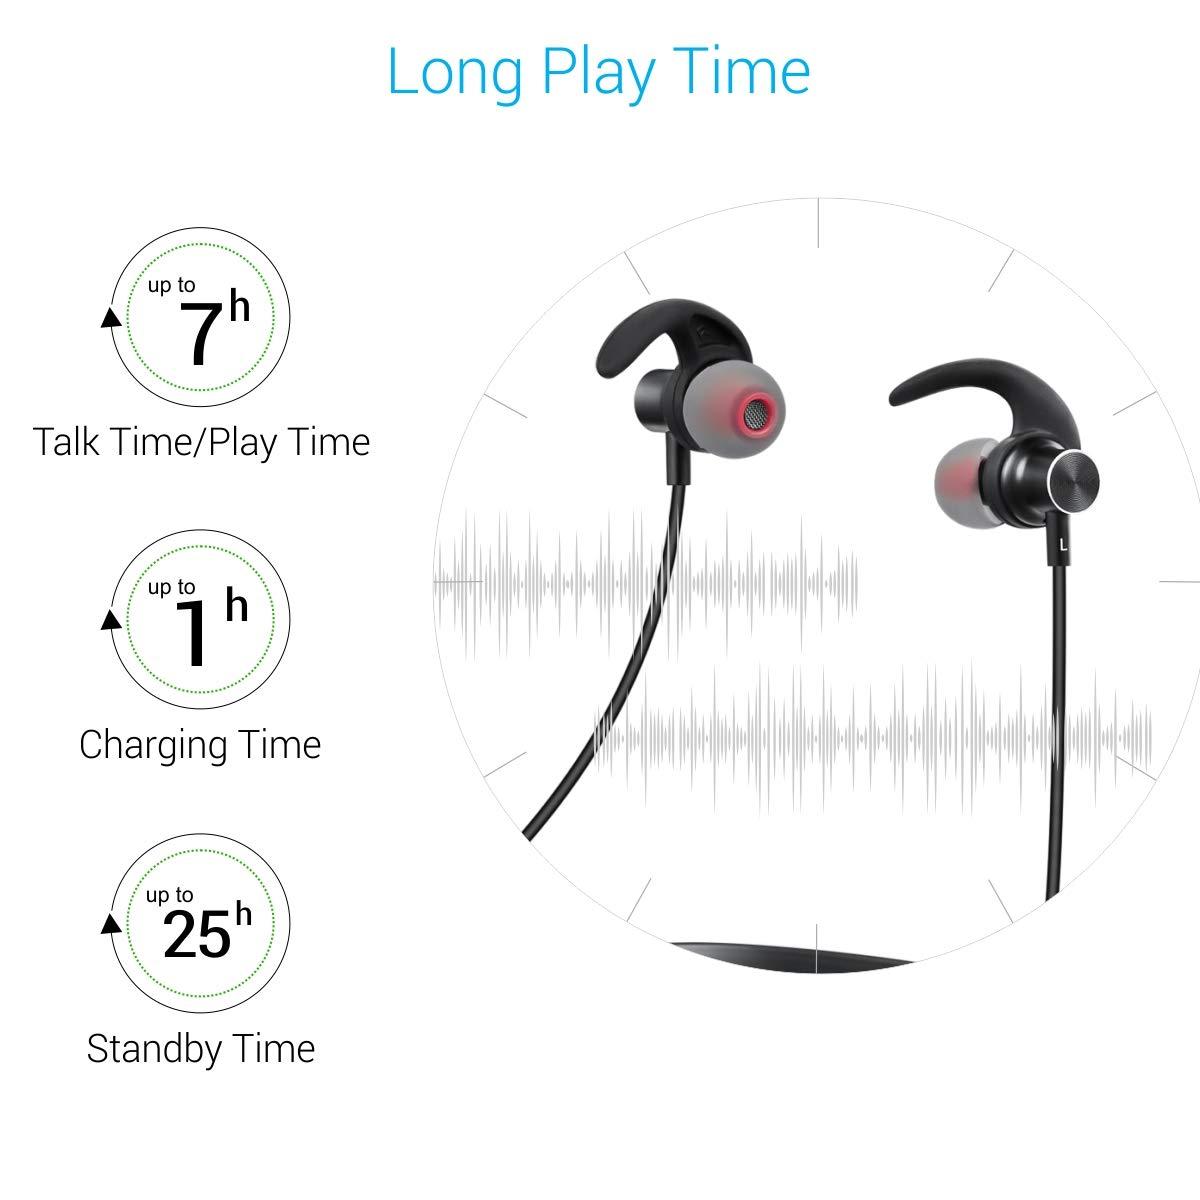 Portronics Harmonics 216 HD Stereo Wireless Headset